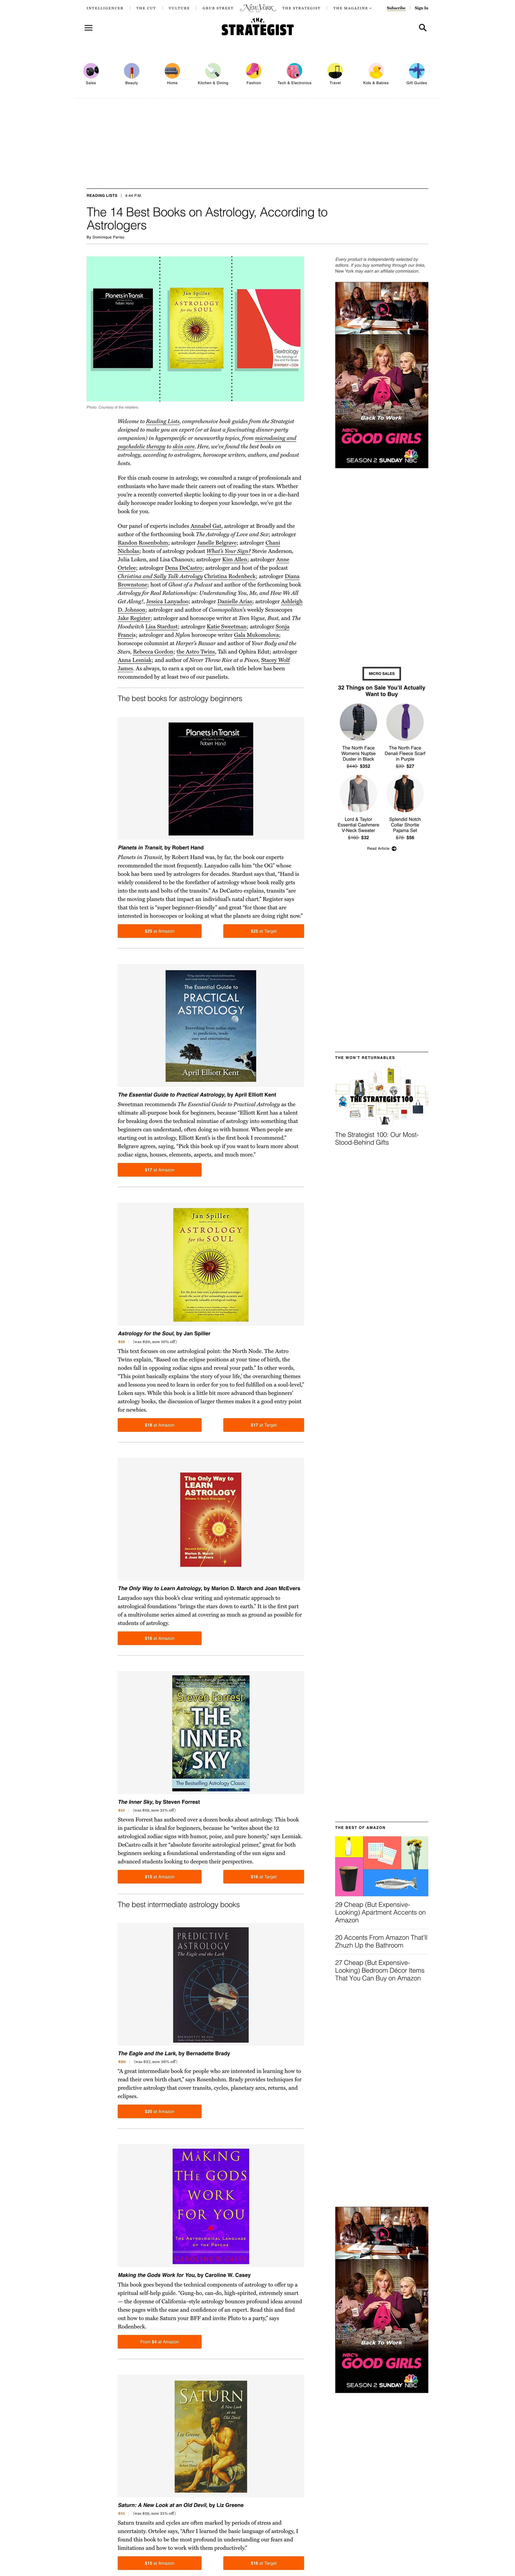 screencapture-nymag-strategist-article-best-books-astrology-html-2019-03-01-12_09_54 copy.jpg